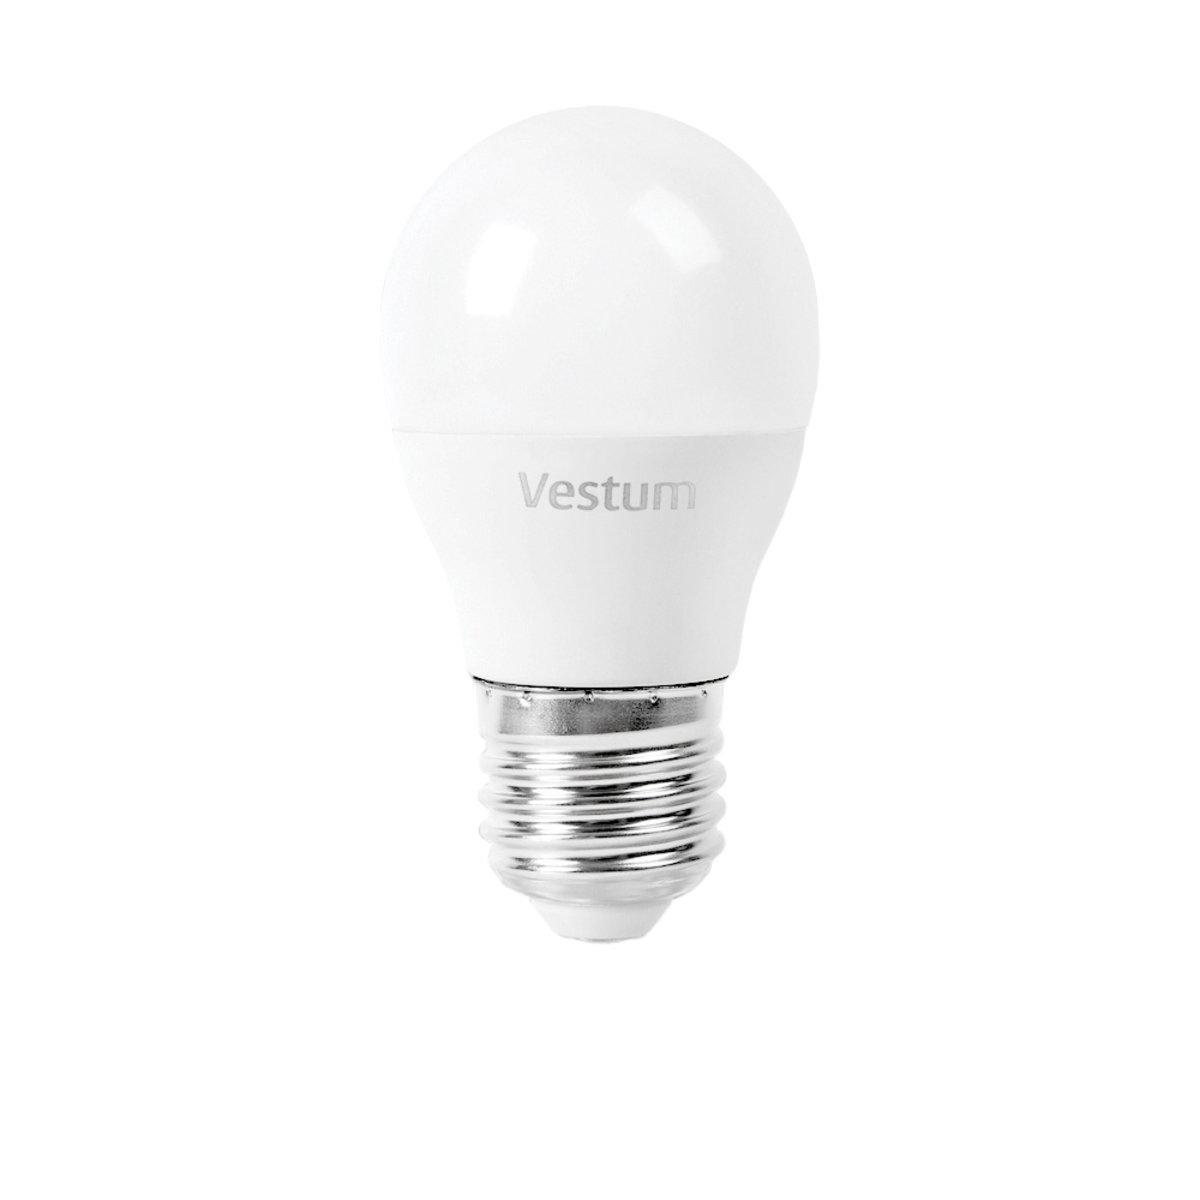 Світлодіодна лампа LED G45 8W 3000K 220V E27 ТМ Vestum